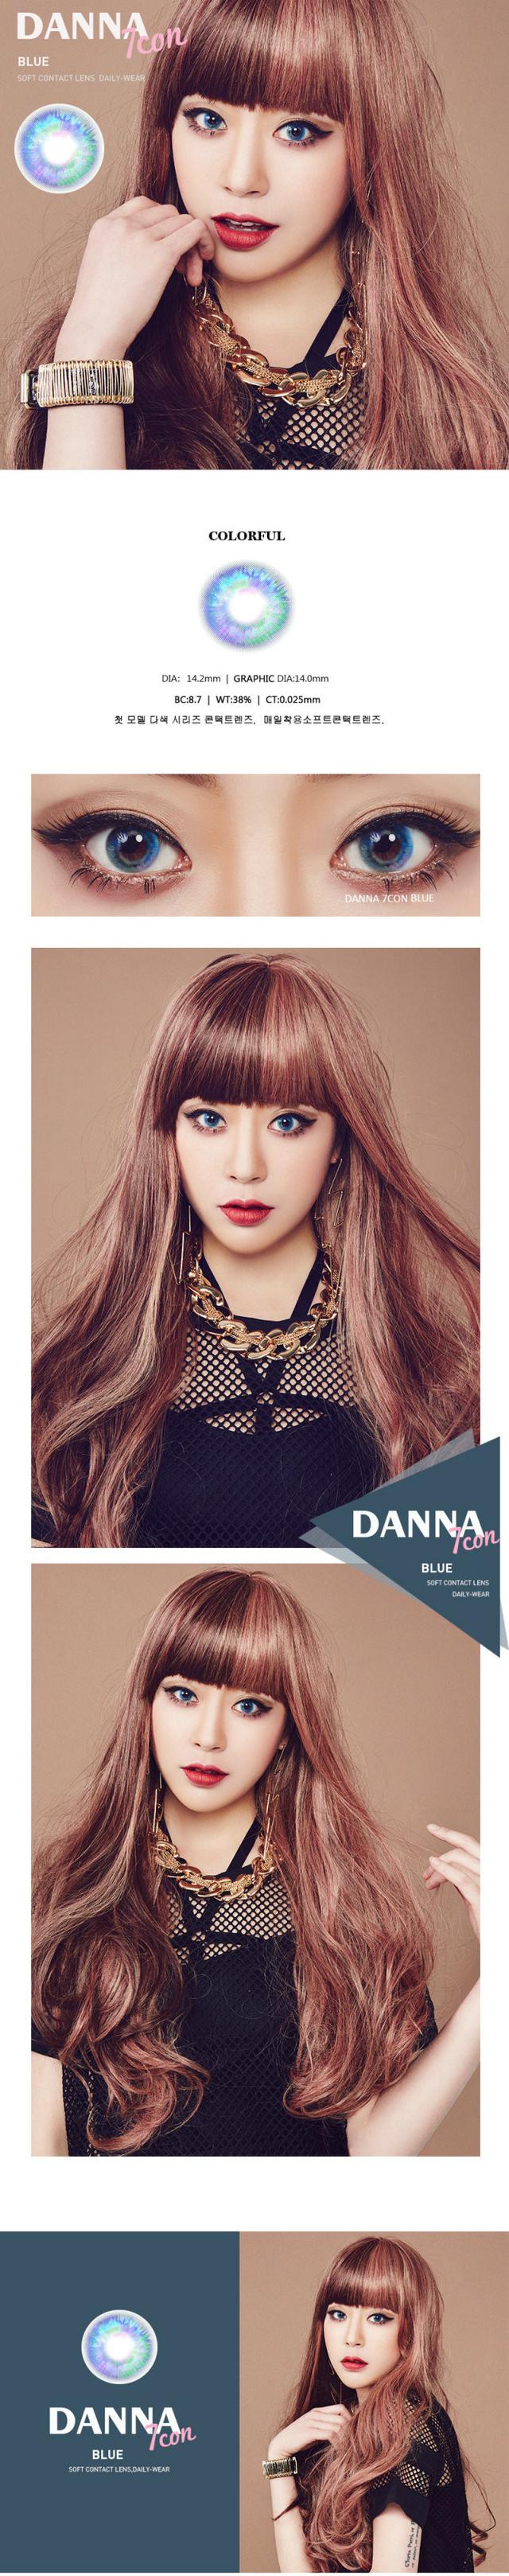 14.20mm Danna 7Con (7 Colors) Contact Lens Color Blue - $35.99 : contactlensdropshipping.com, online shopping